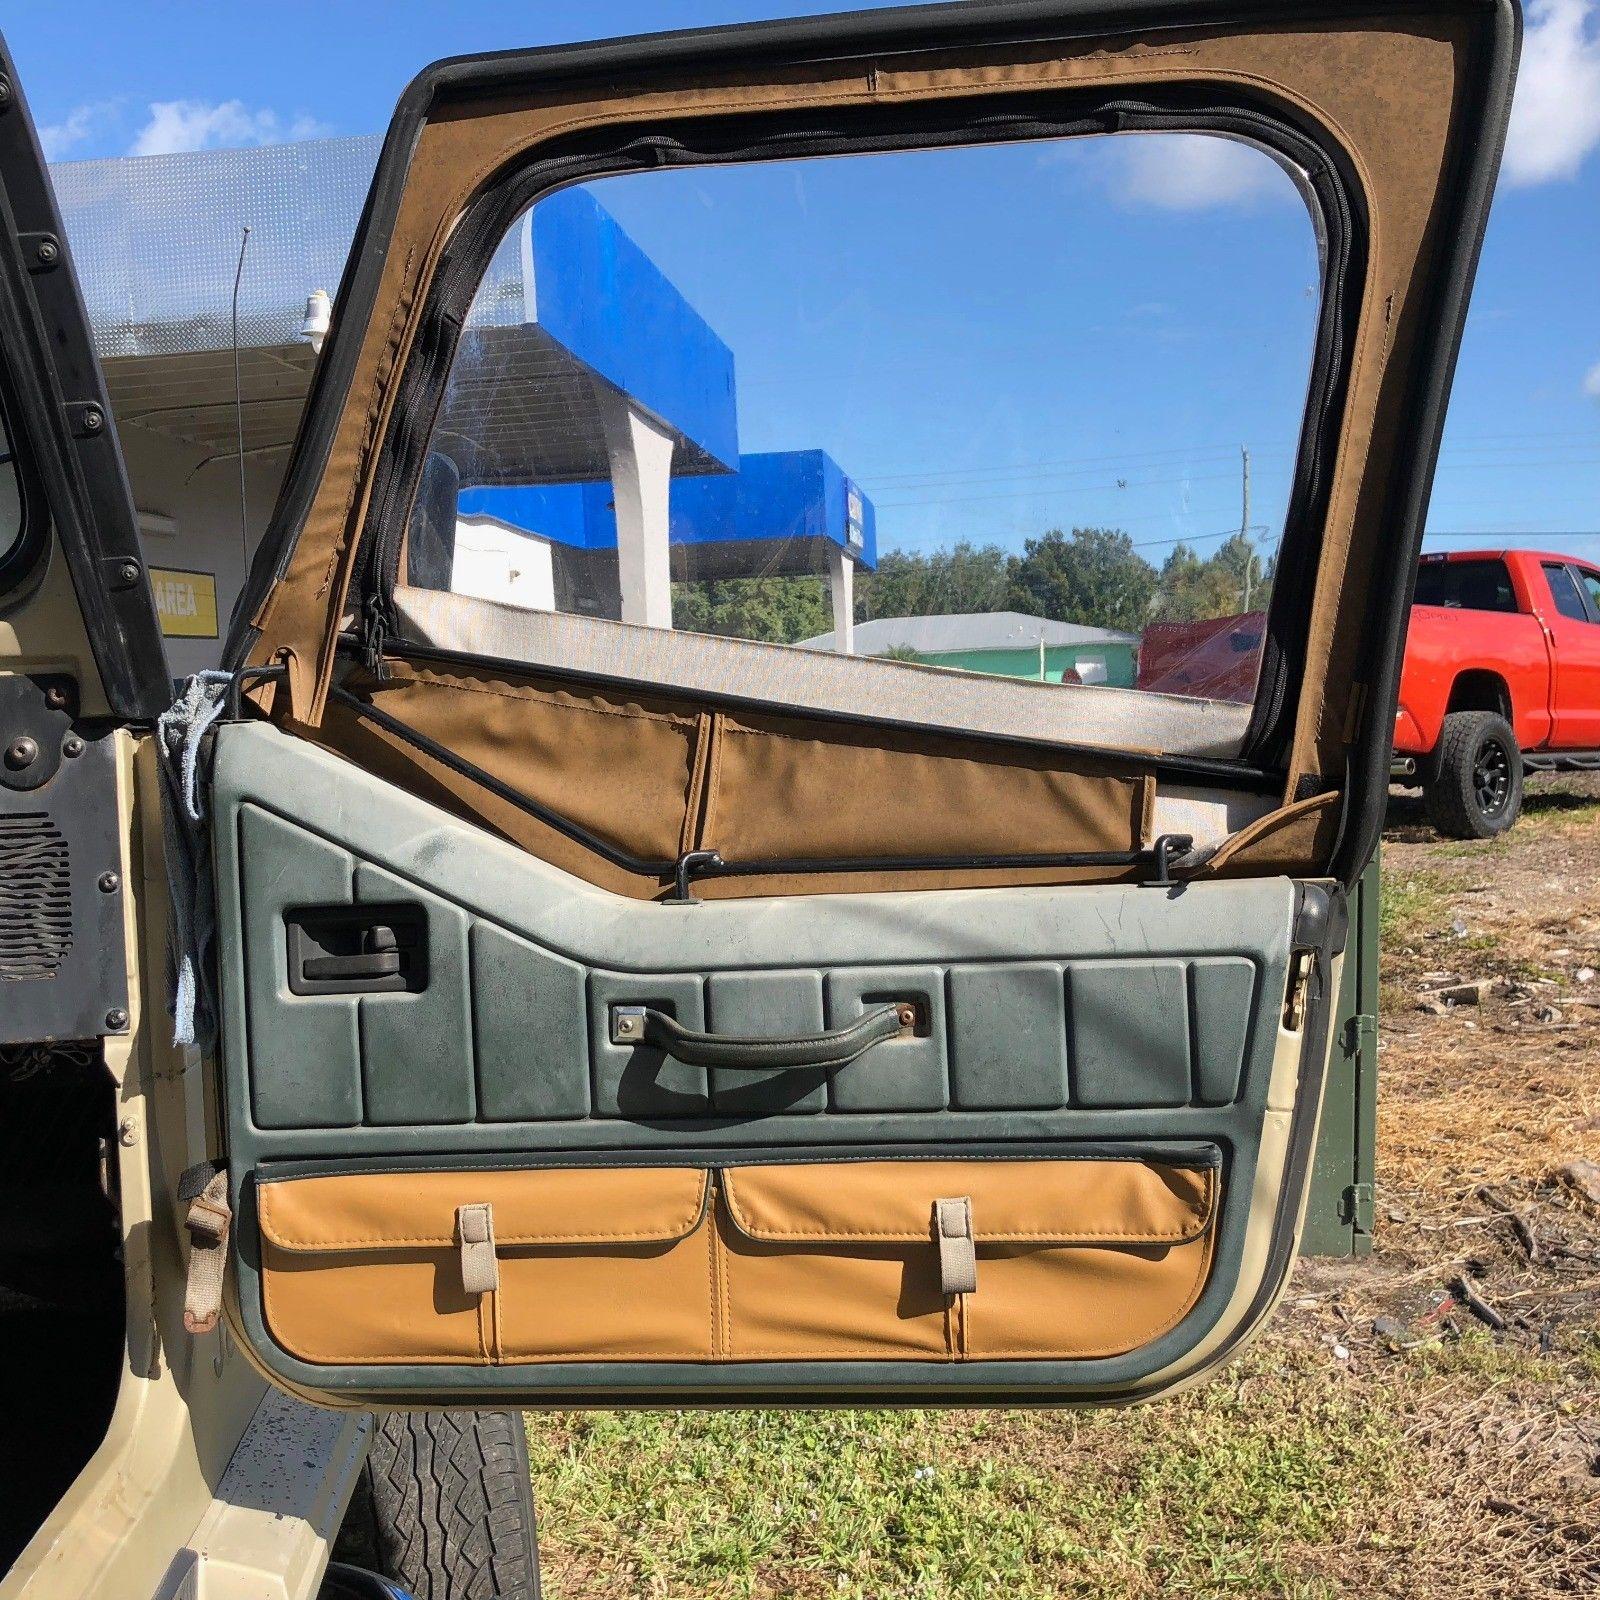 2018 Camry Le >> Awesome 1992 Jeep Wrangler Sahara Edition 1992 AMC JEEP ...